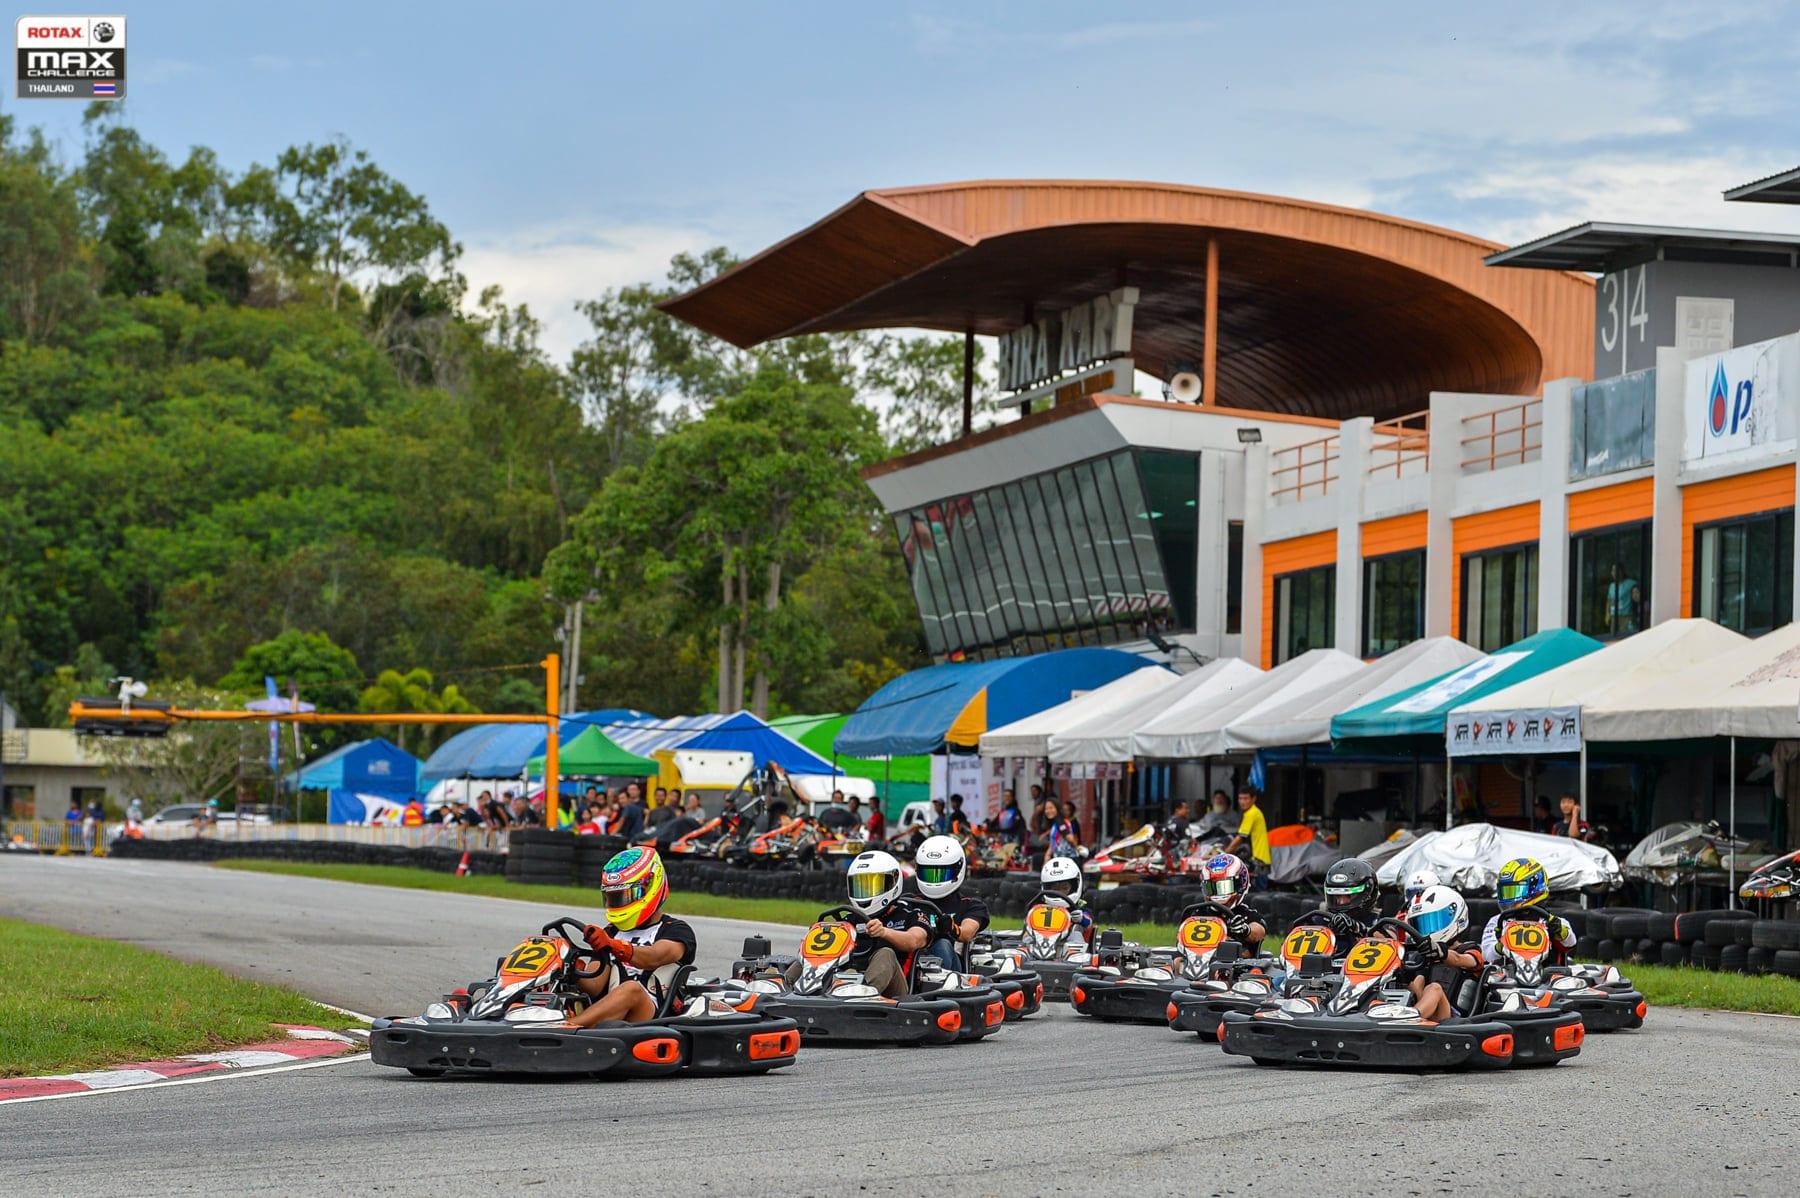 RMCTH R.4-5 Official Practice & BIRA Fun Kart.